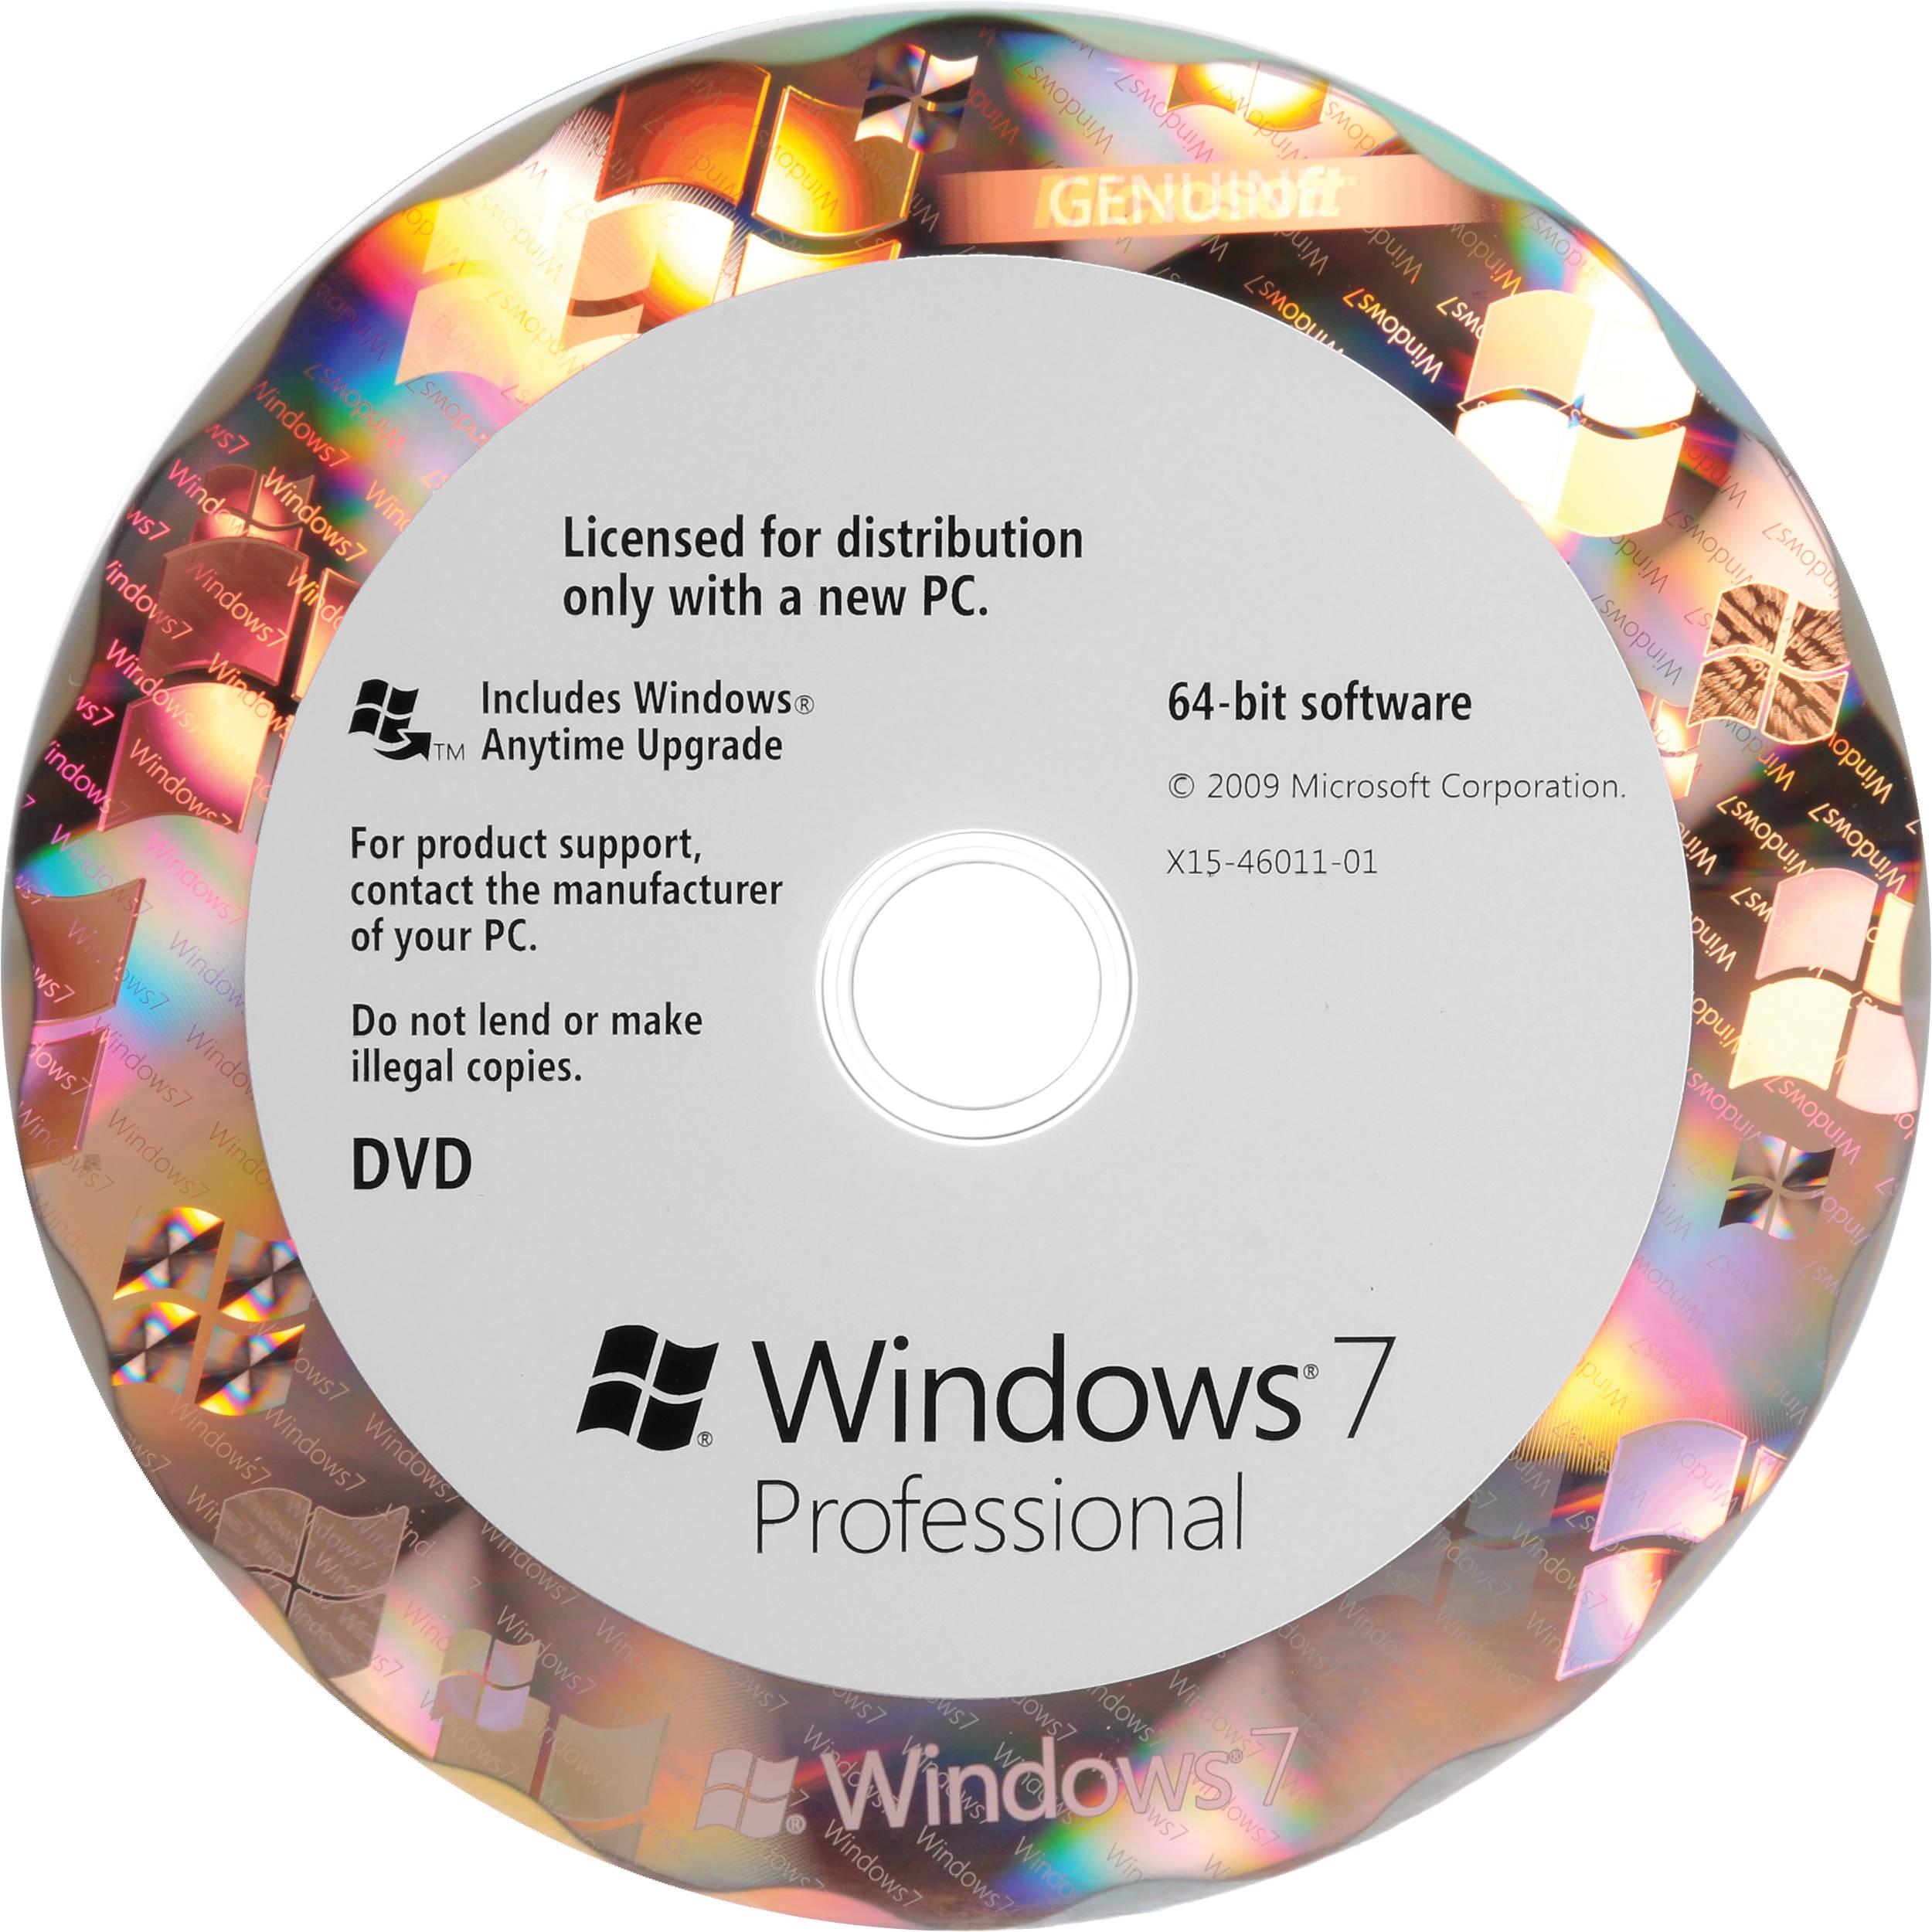 microsoft windows 7 professional 64 bit oem dvd fqc. Black Bedroom Furniture Sets. Home Design Ideas